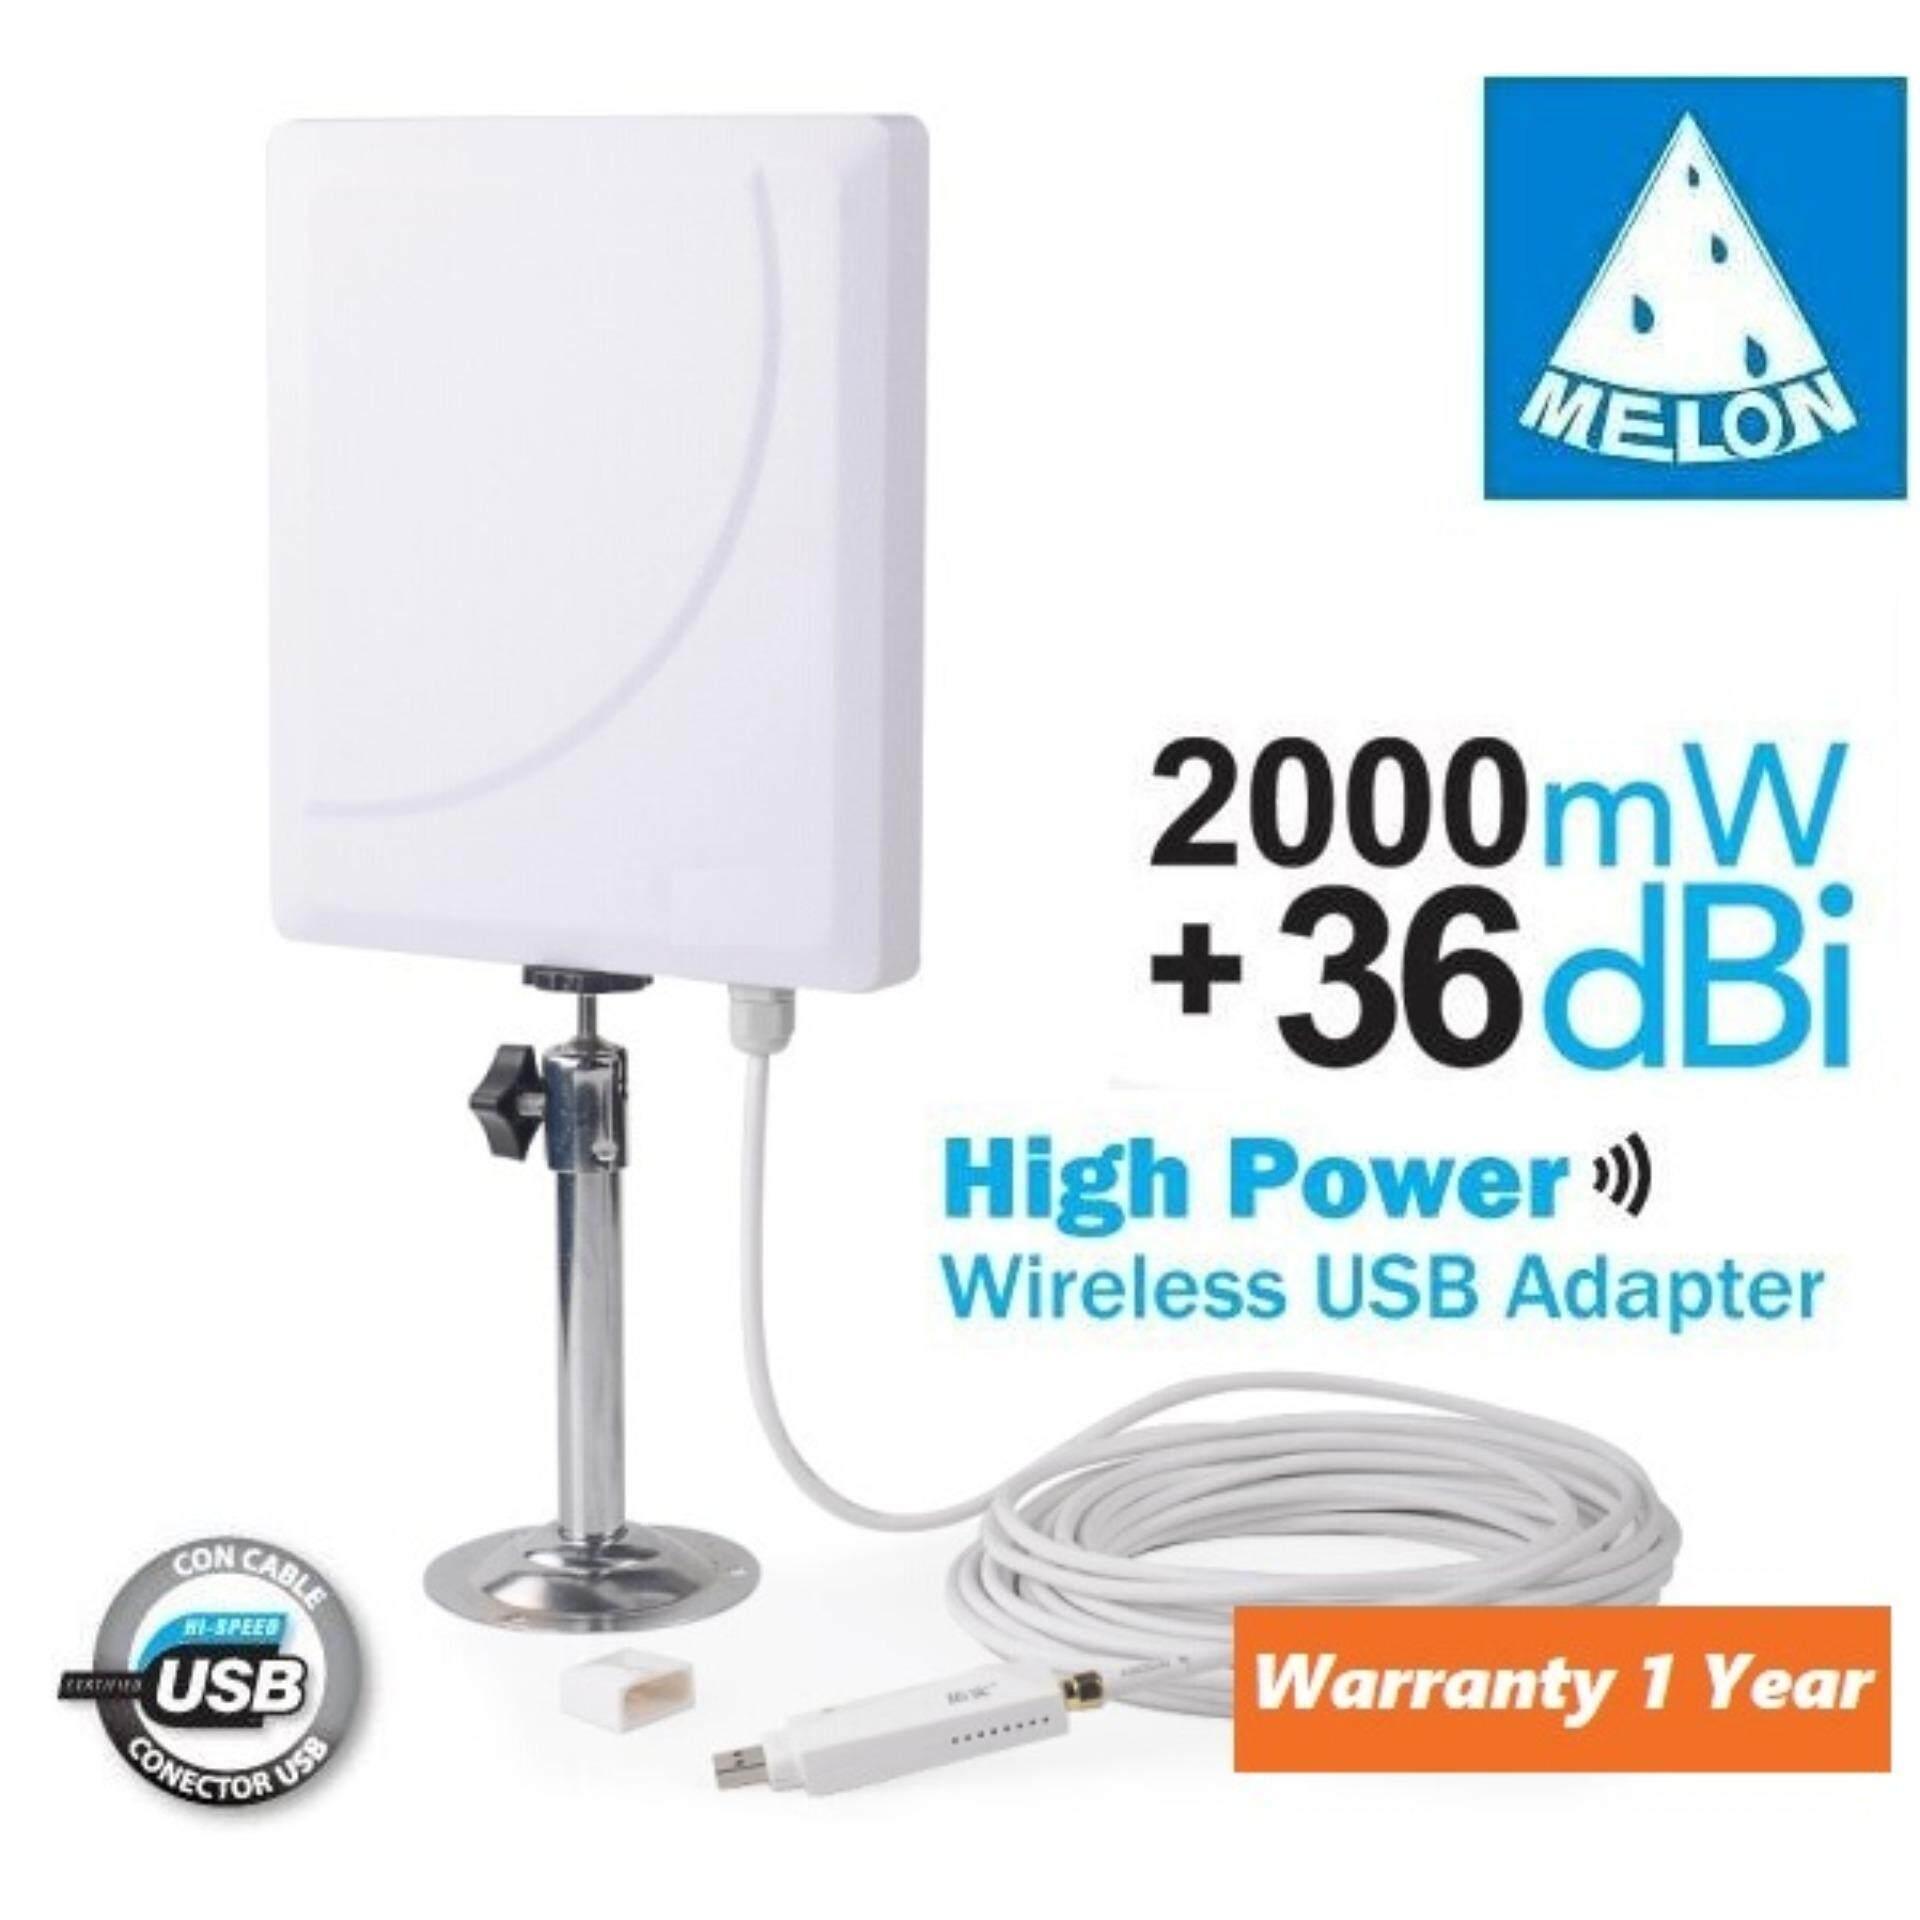 Usb Wifi Adapter High Power ตัวรับสัญญาณ Wifi Outdoor ระยะไกล สัญญาณแรงสุดๆ Melon N918.